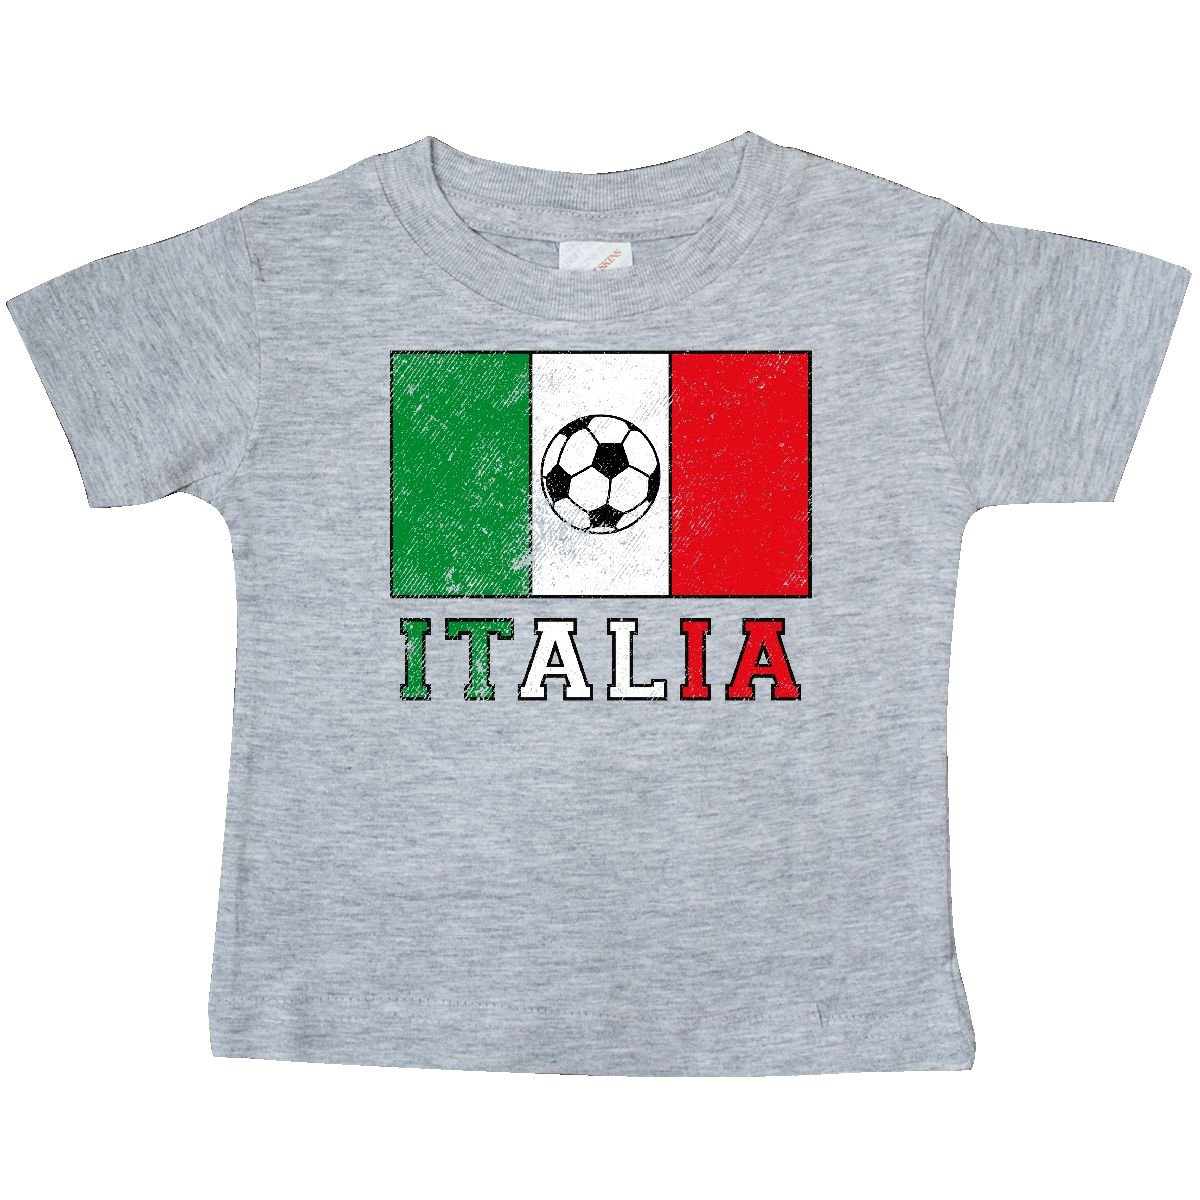 Amazon Com Inktastic Italian Soccer Baby T Shirt 2e0d2 Clothing